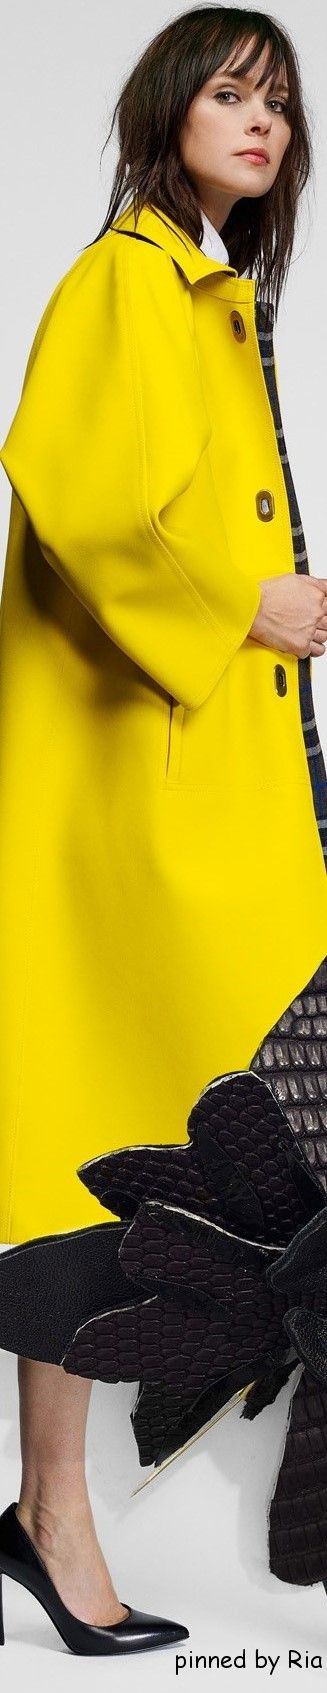 AMARILLO....❤ yellow coat women fashion outfit clothing style apparel @roressclothes closet ideas